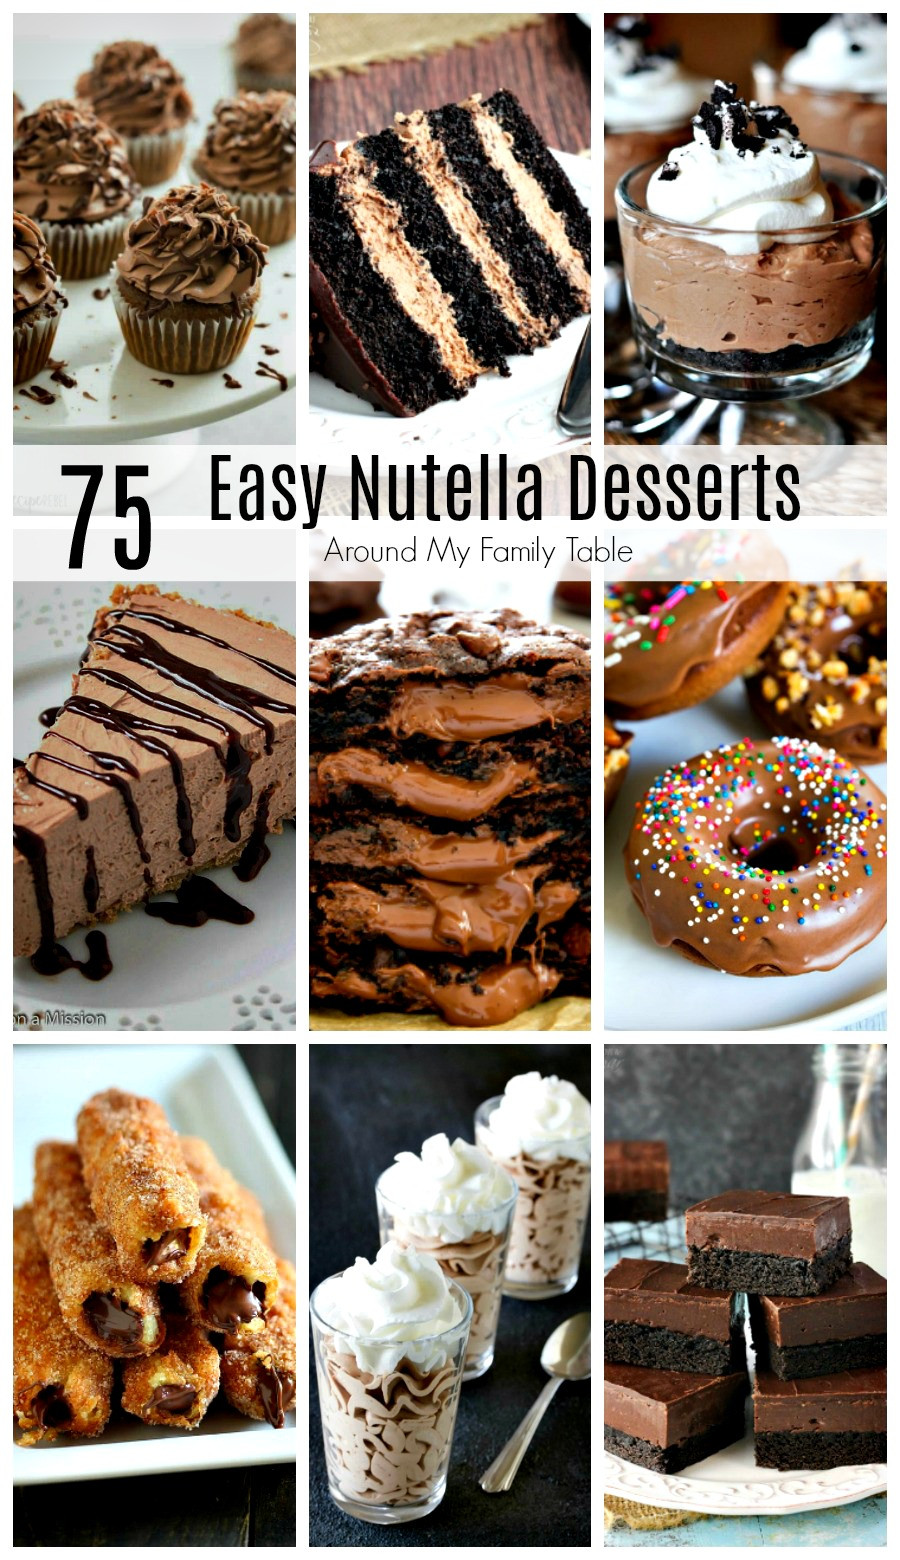 Nutella Dessert Recipes  75 Nutella Dessert Recipes Around My Family Table